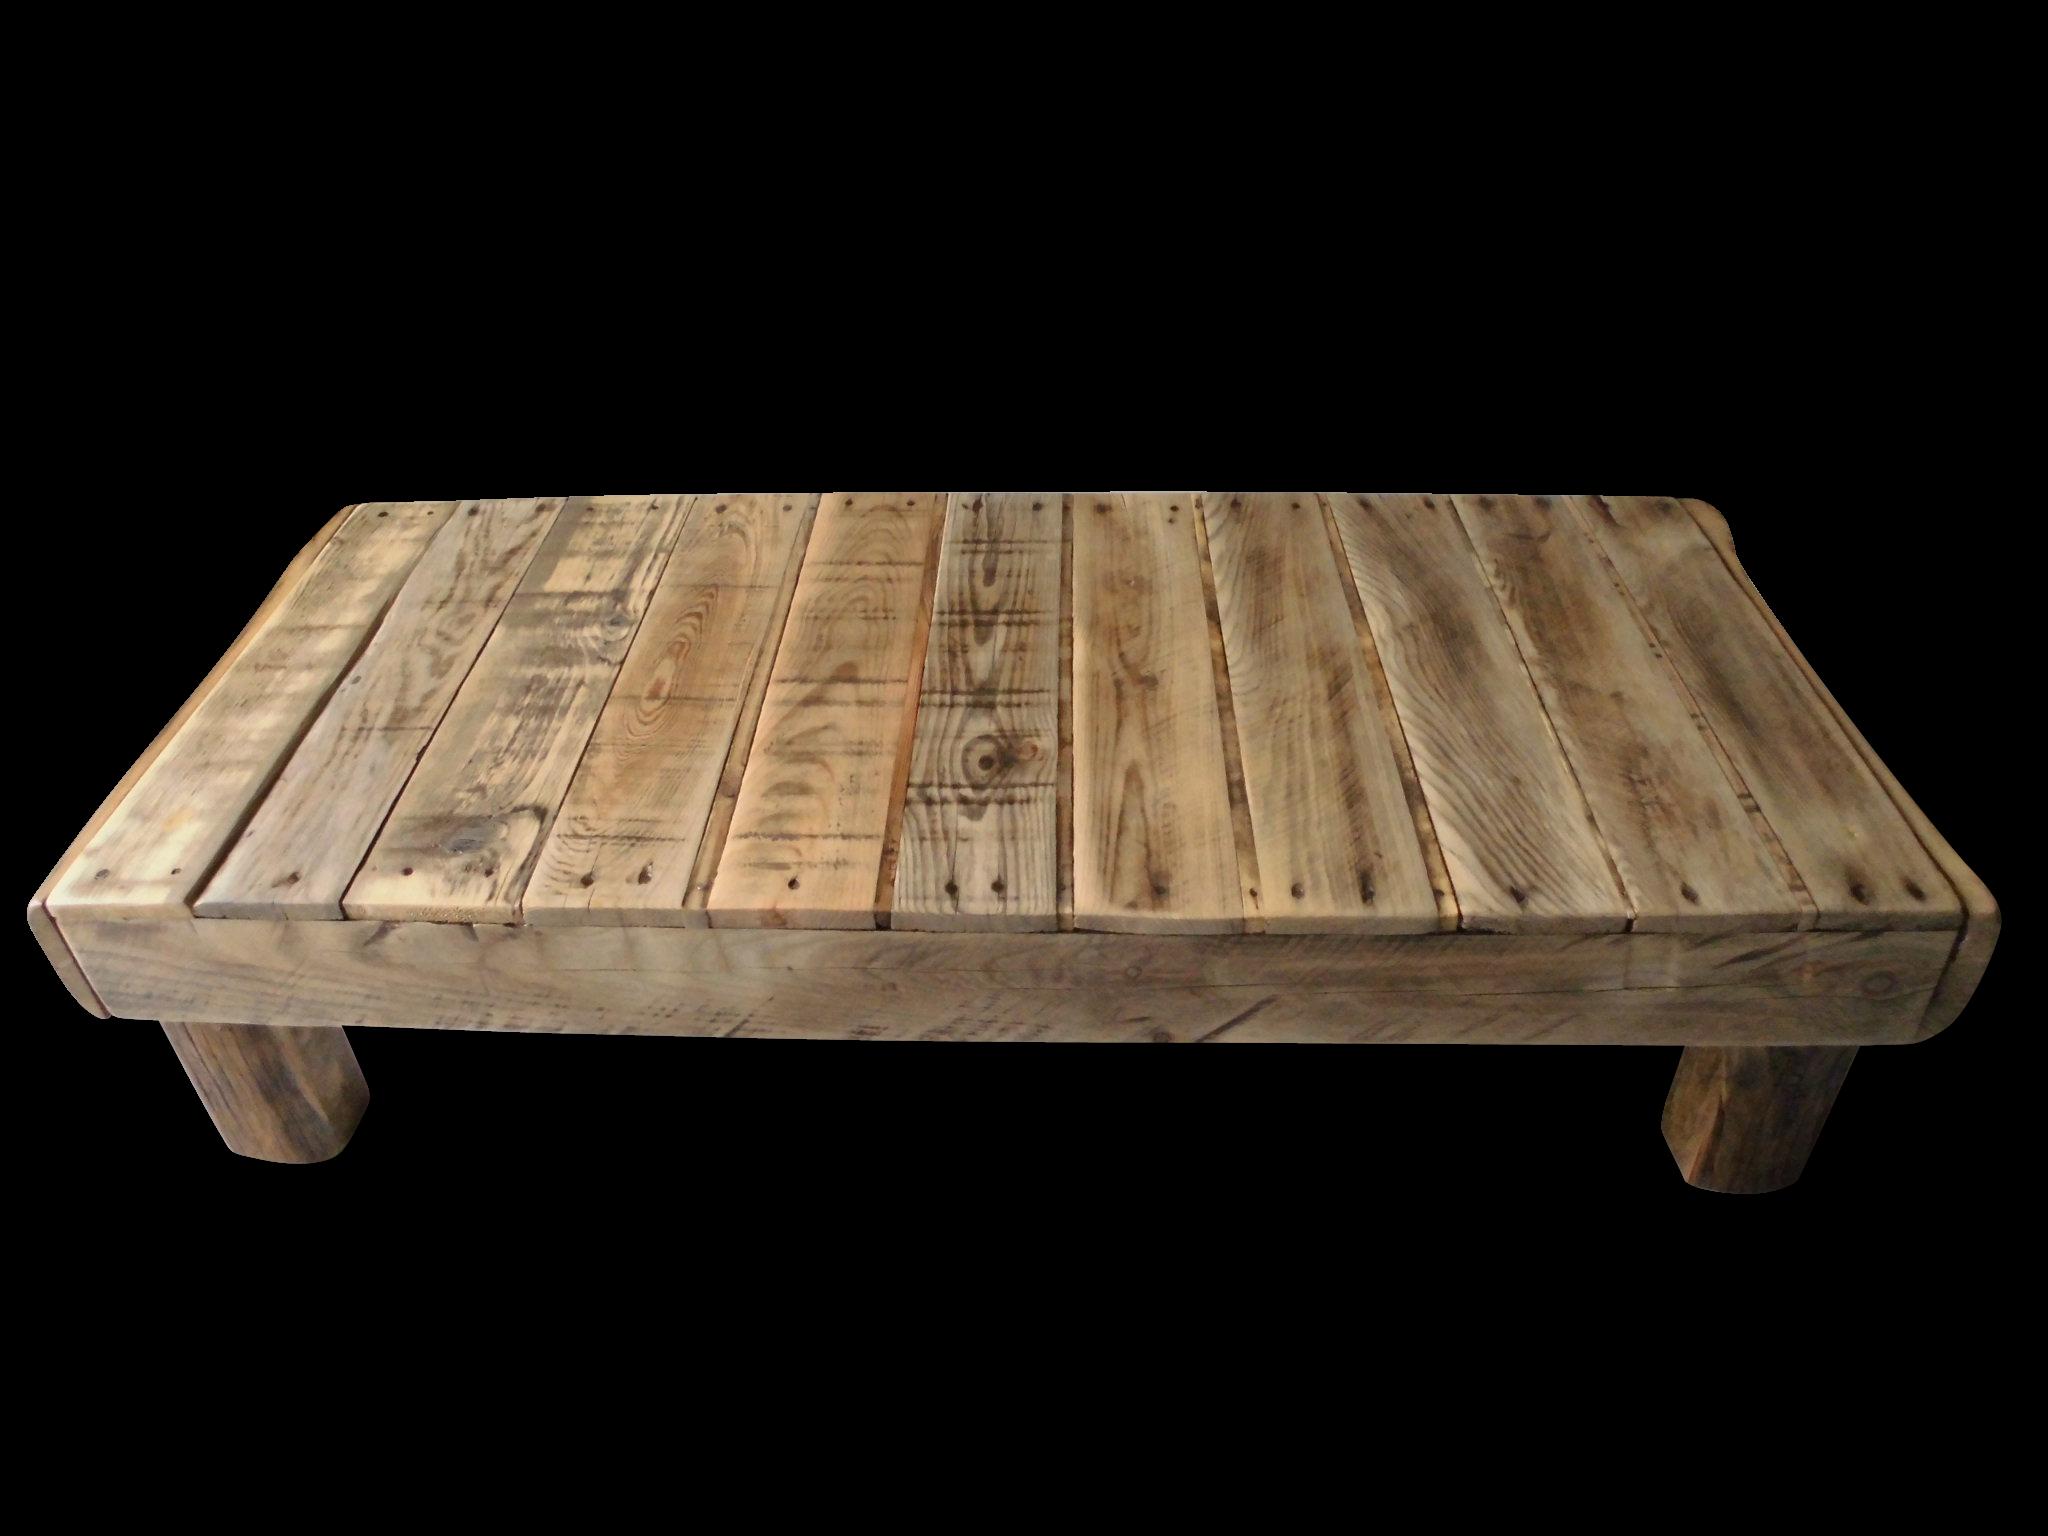 table basse fabrication maison table basse fait maison table basse fabrication maison survl. Black Bedroom Furniture Sets. Home Design Ideas